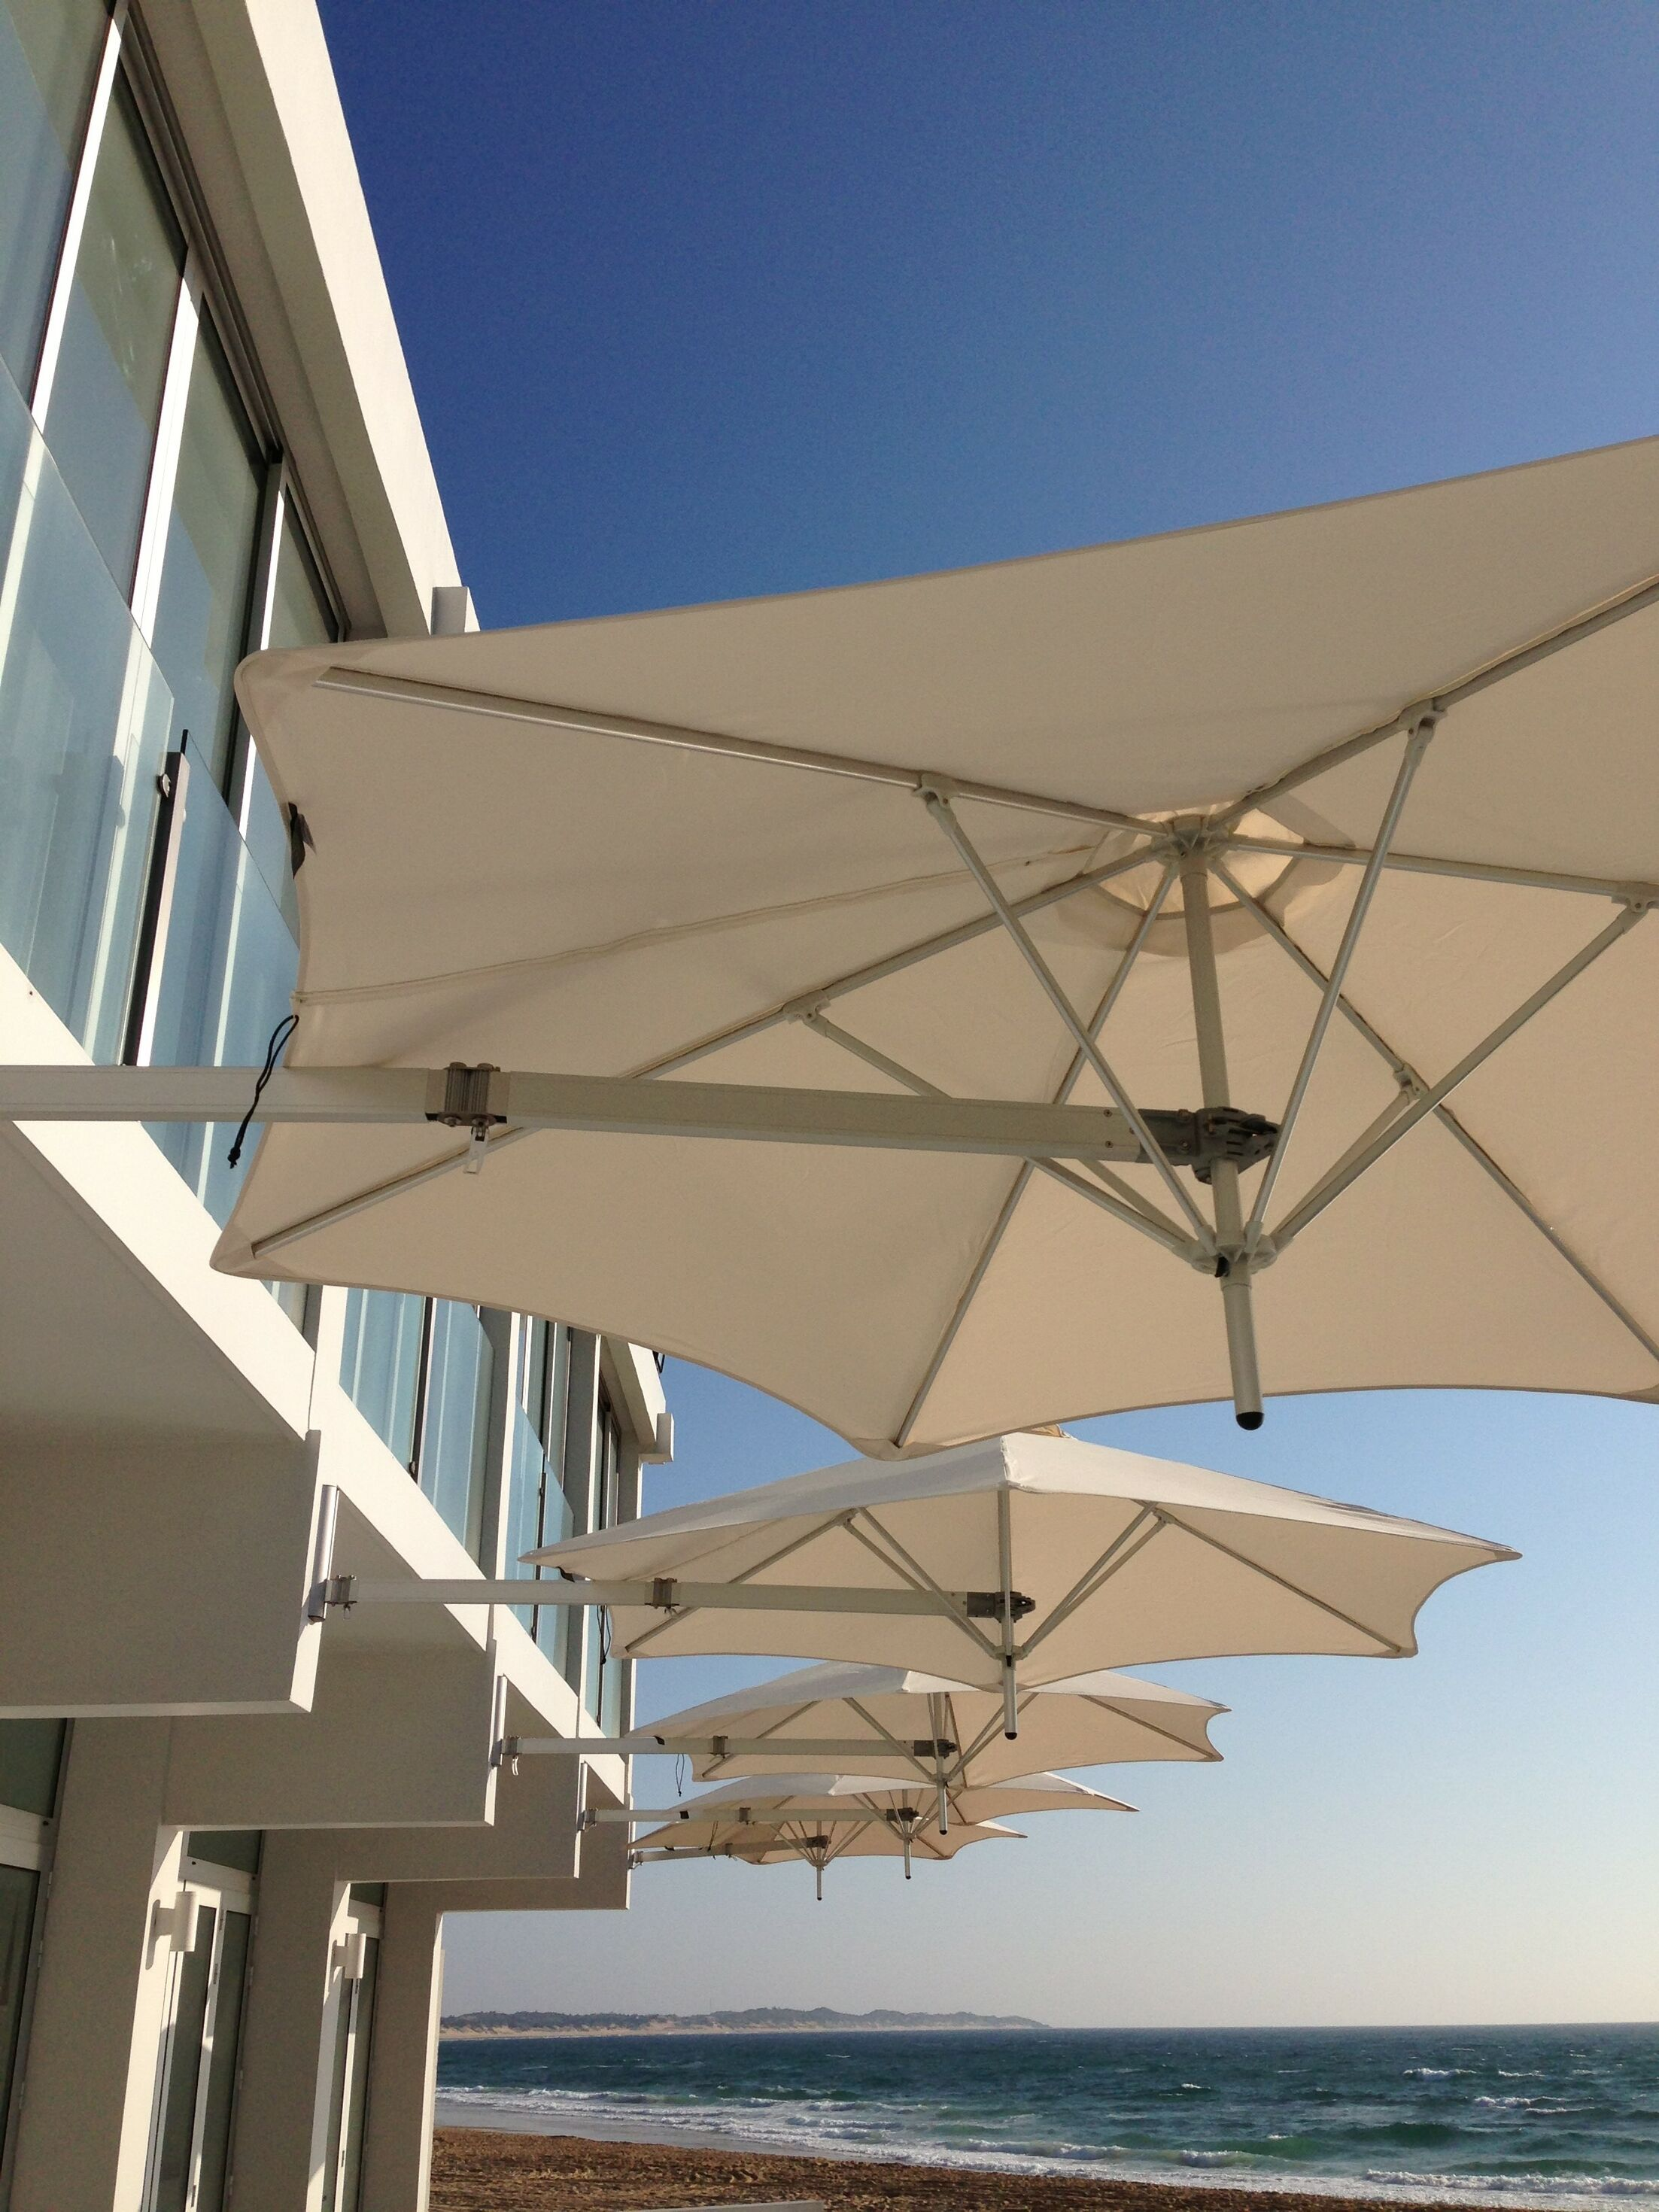 Paraflex 9' Wall Mount Umbrella Fabric: Sunbrella Acrylic - Natural White